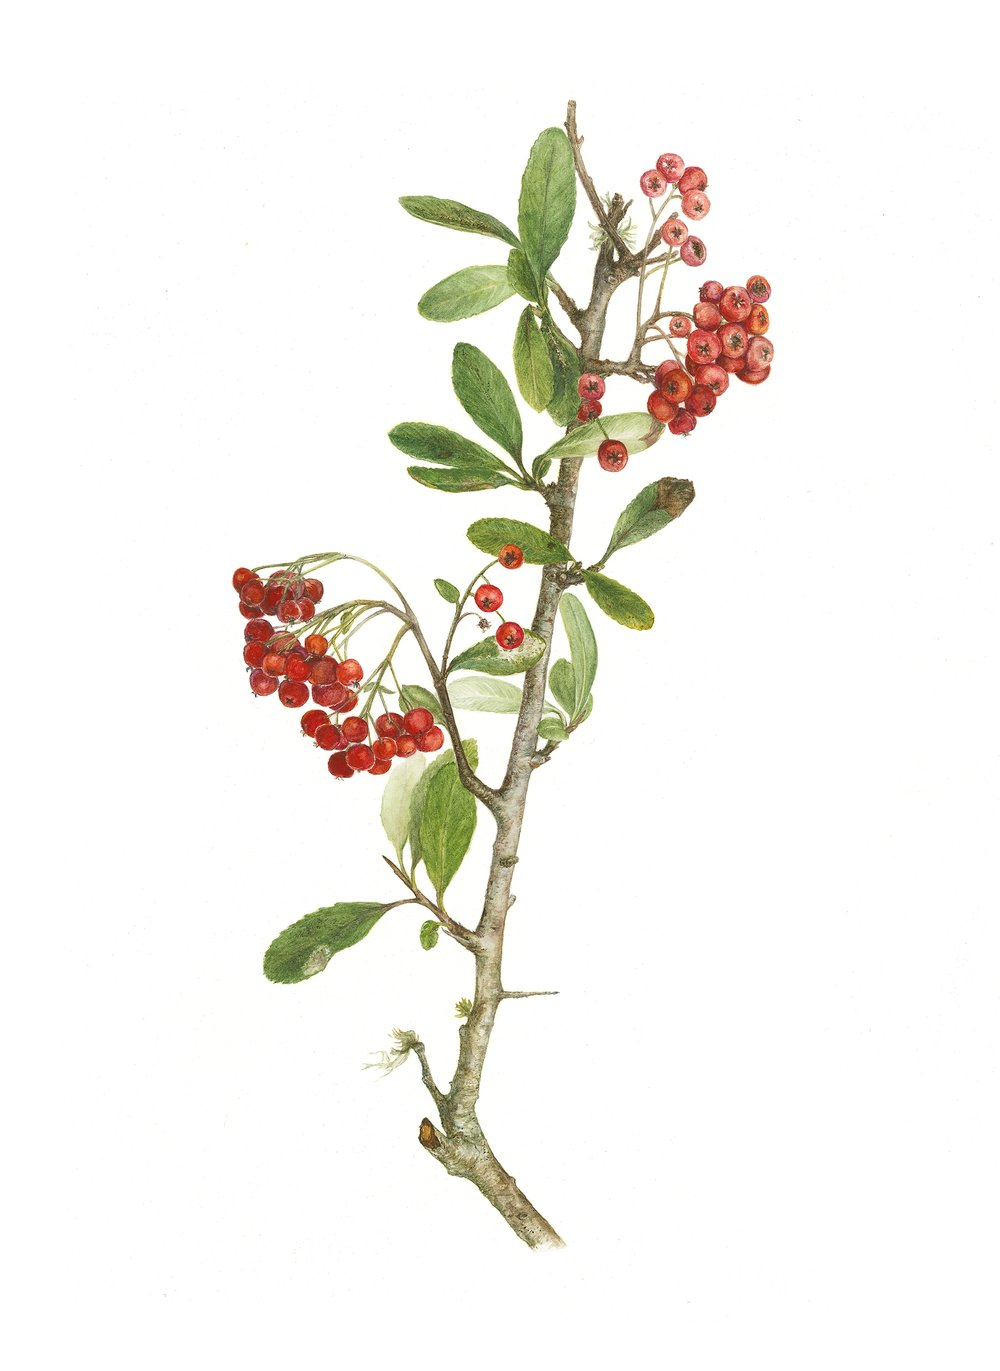 Scarlet Firethorn, Pyracantha coccinea